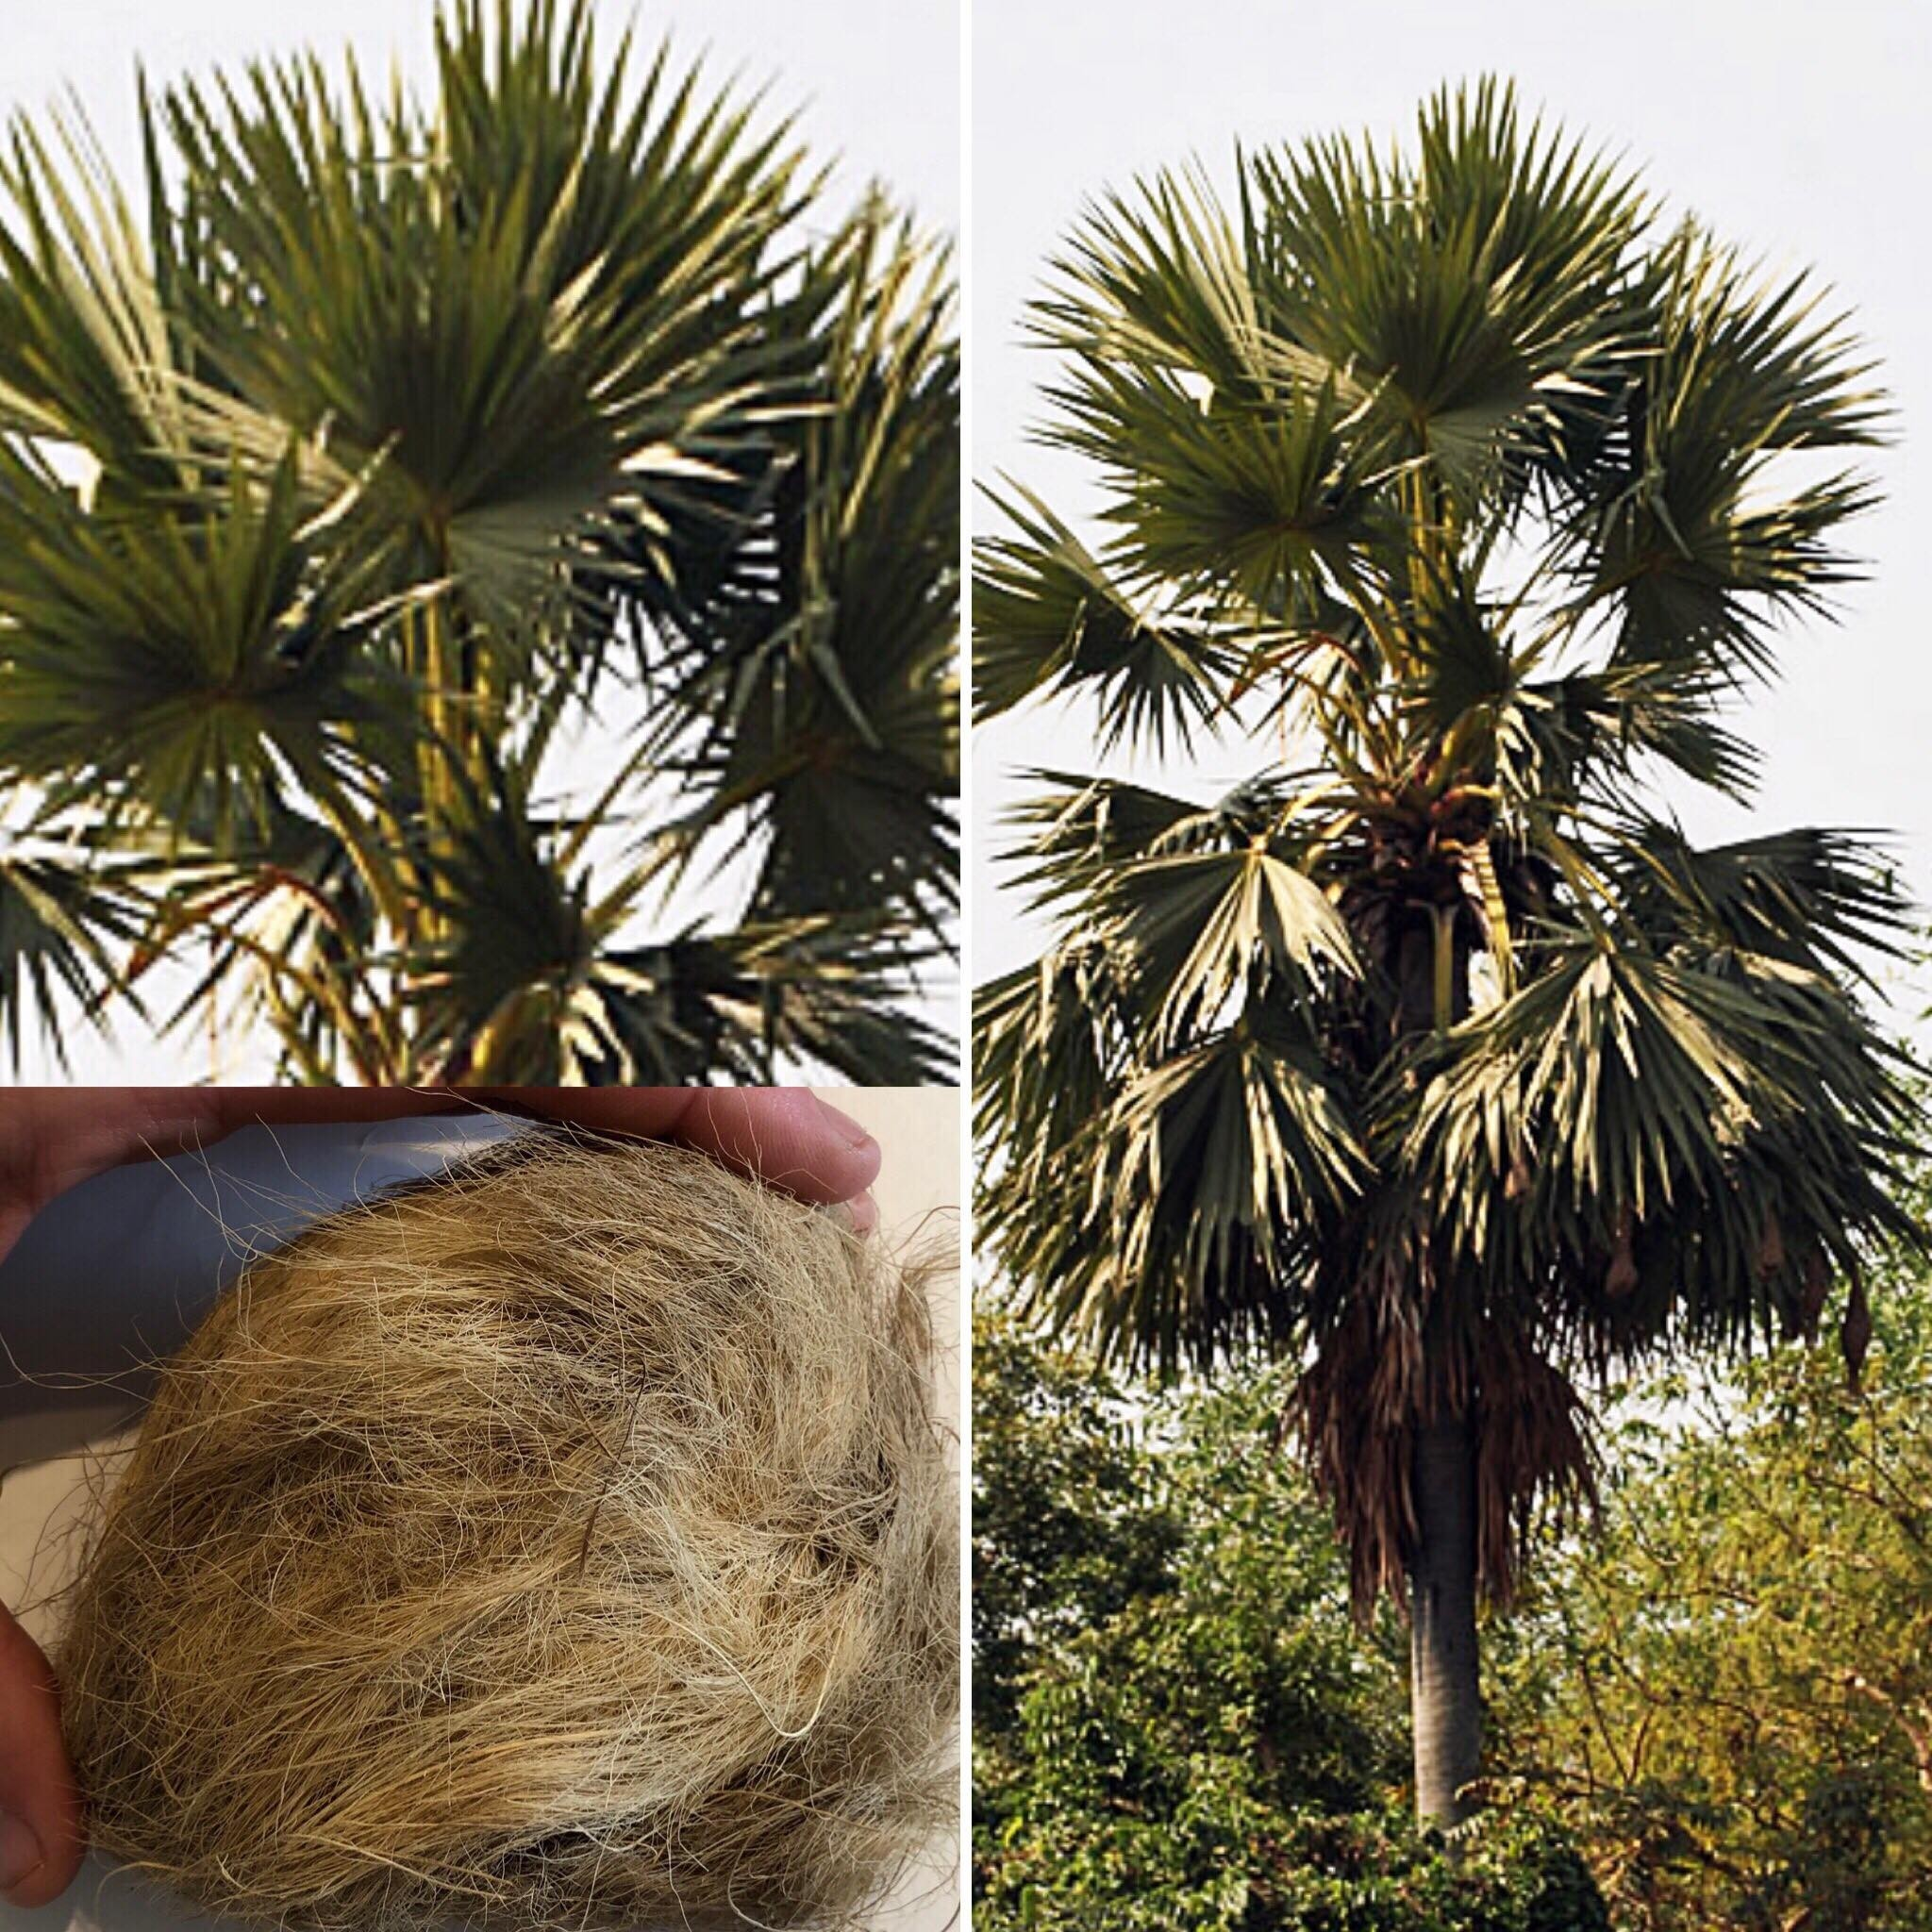 Palmyra-Palme -Borassus flabellifer- 1 Großer Samen